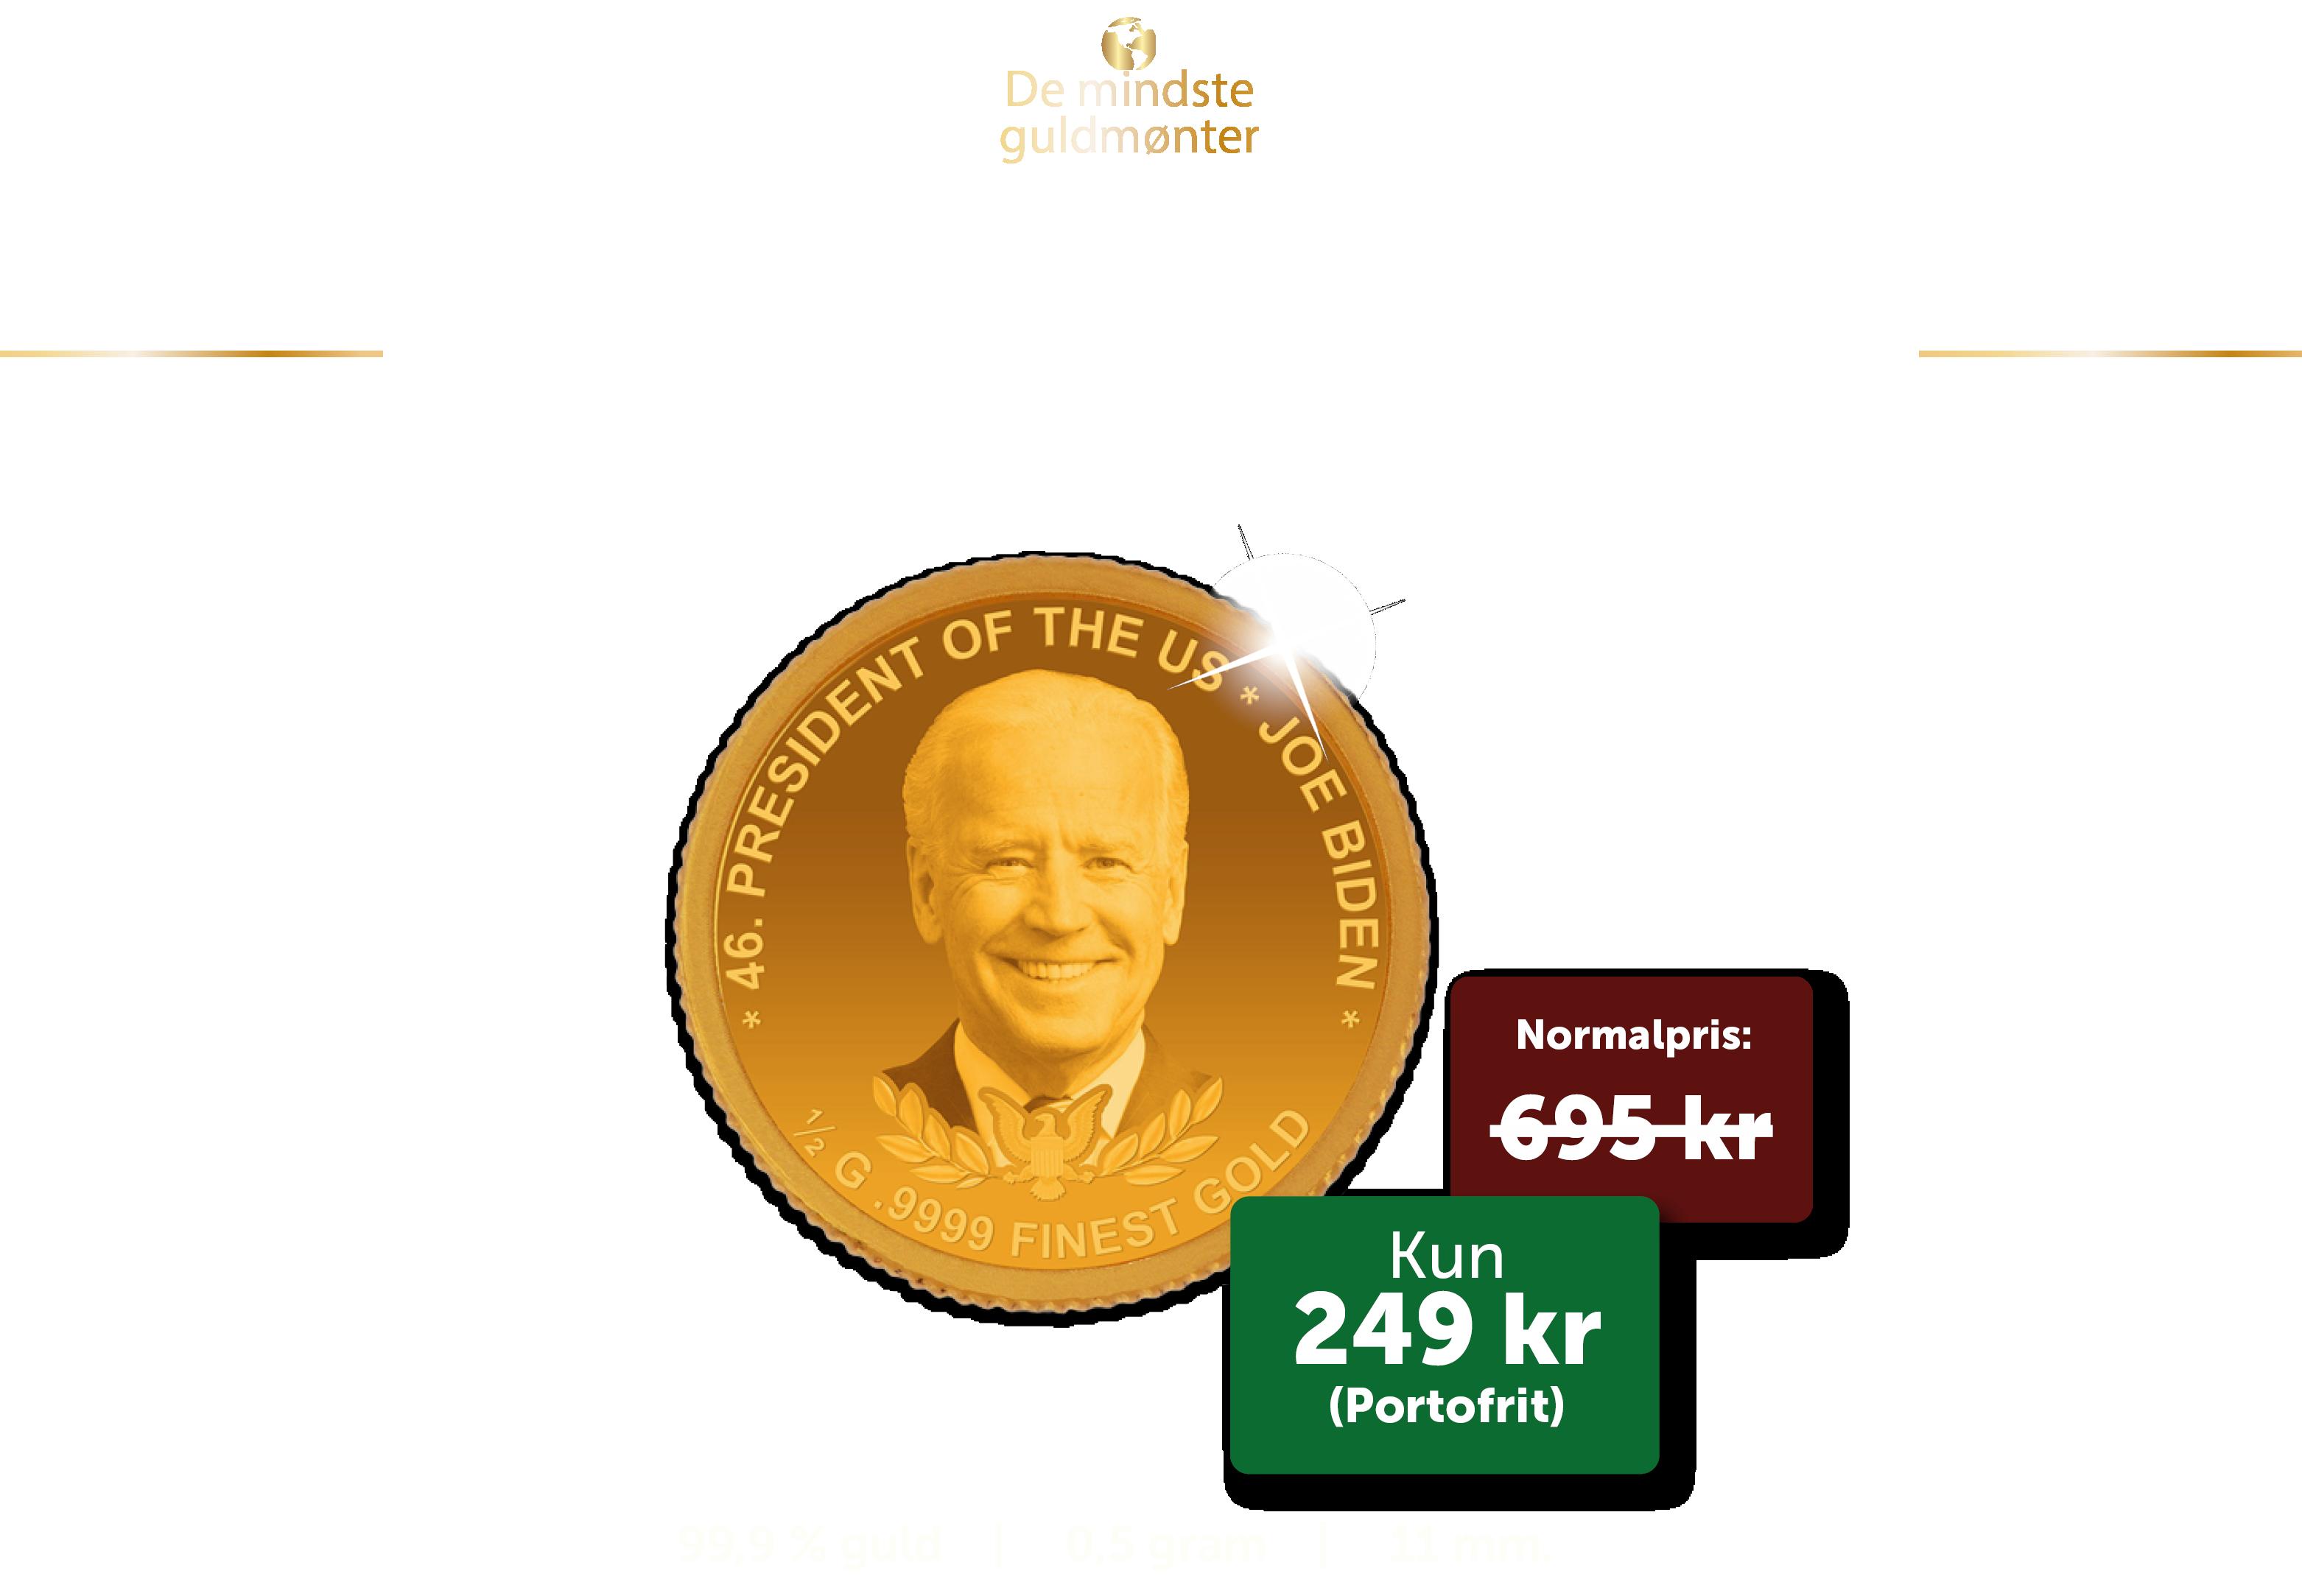 De mindste guldmønter:  USA's næste præsident - Joe Biden